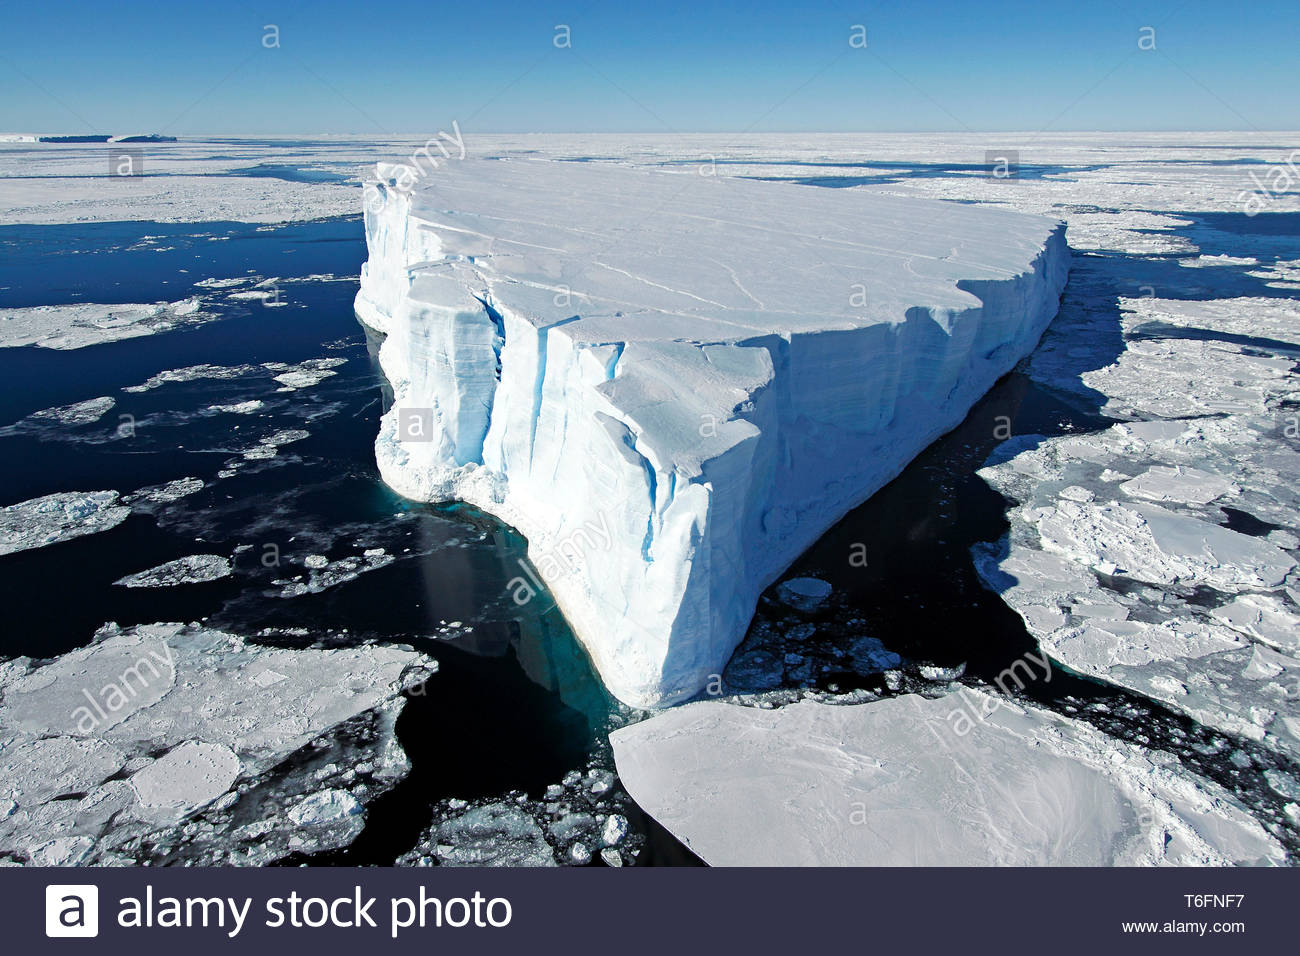 Treibender Eisberg umgeben von Eisschollen, Antarktis | Drifting iceberg, surrounded with ice floes, Antarctic - Stock Image